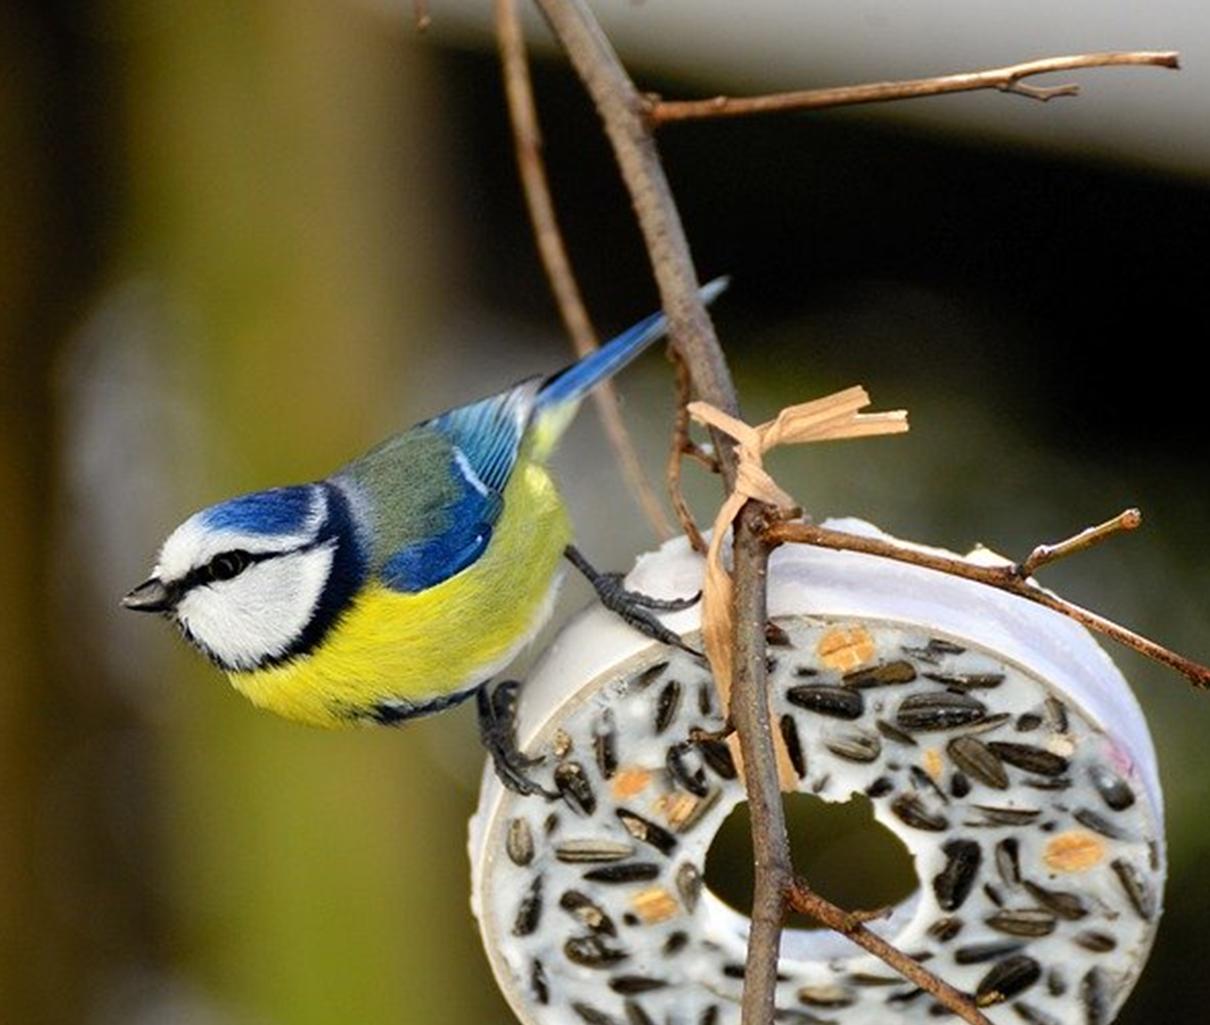 WILD BIRD CARE RANGE